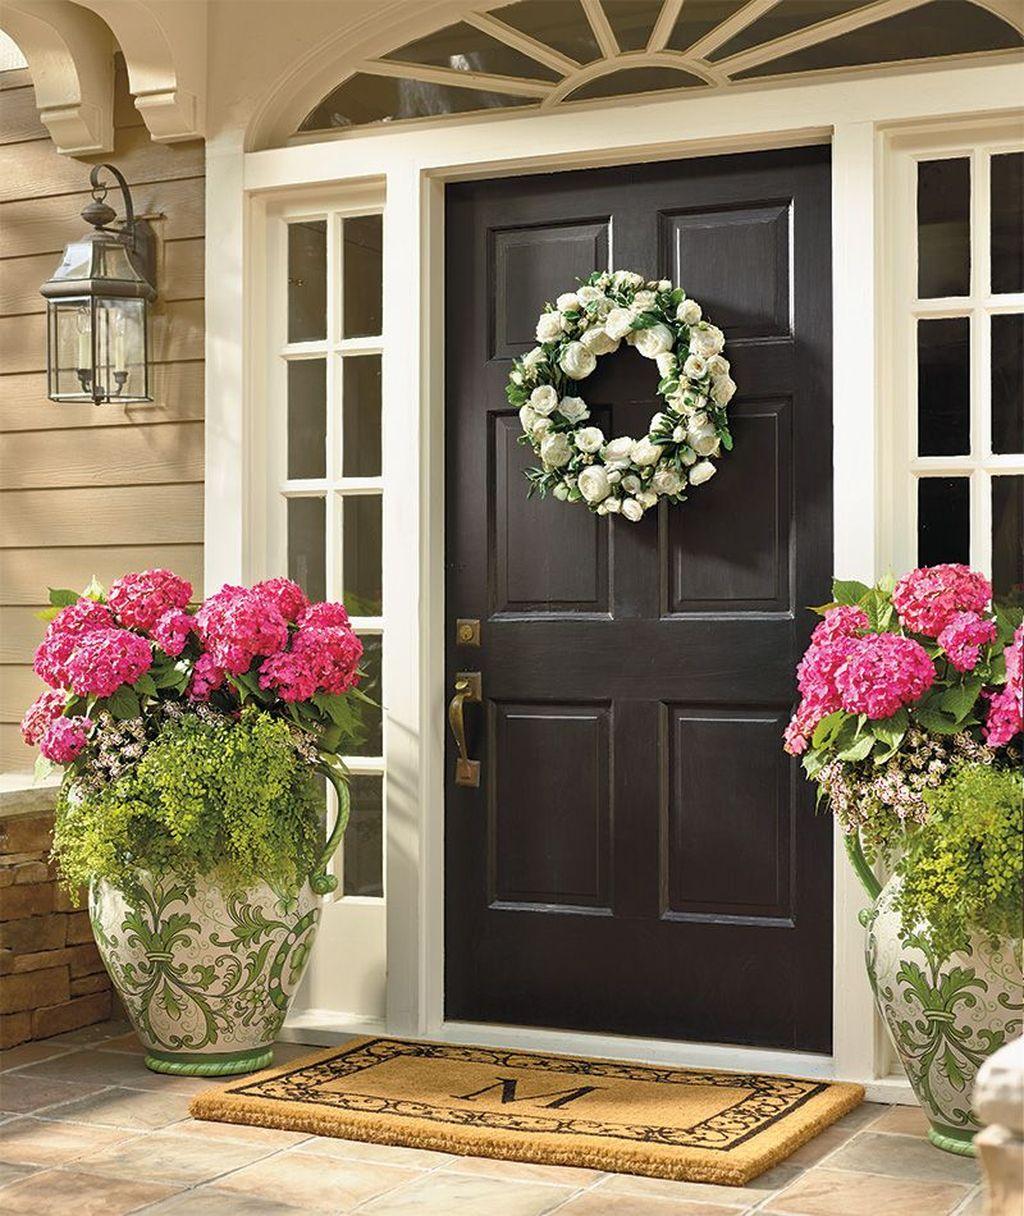 Inspiring Spring Planters Design Ideas For Front Door 14